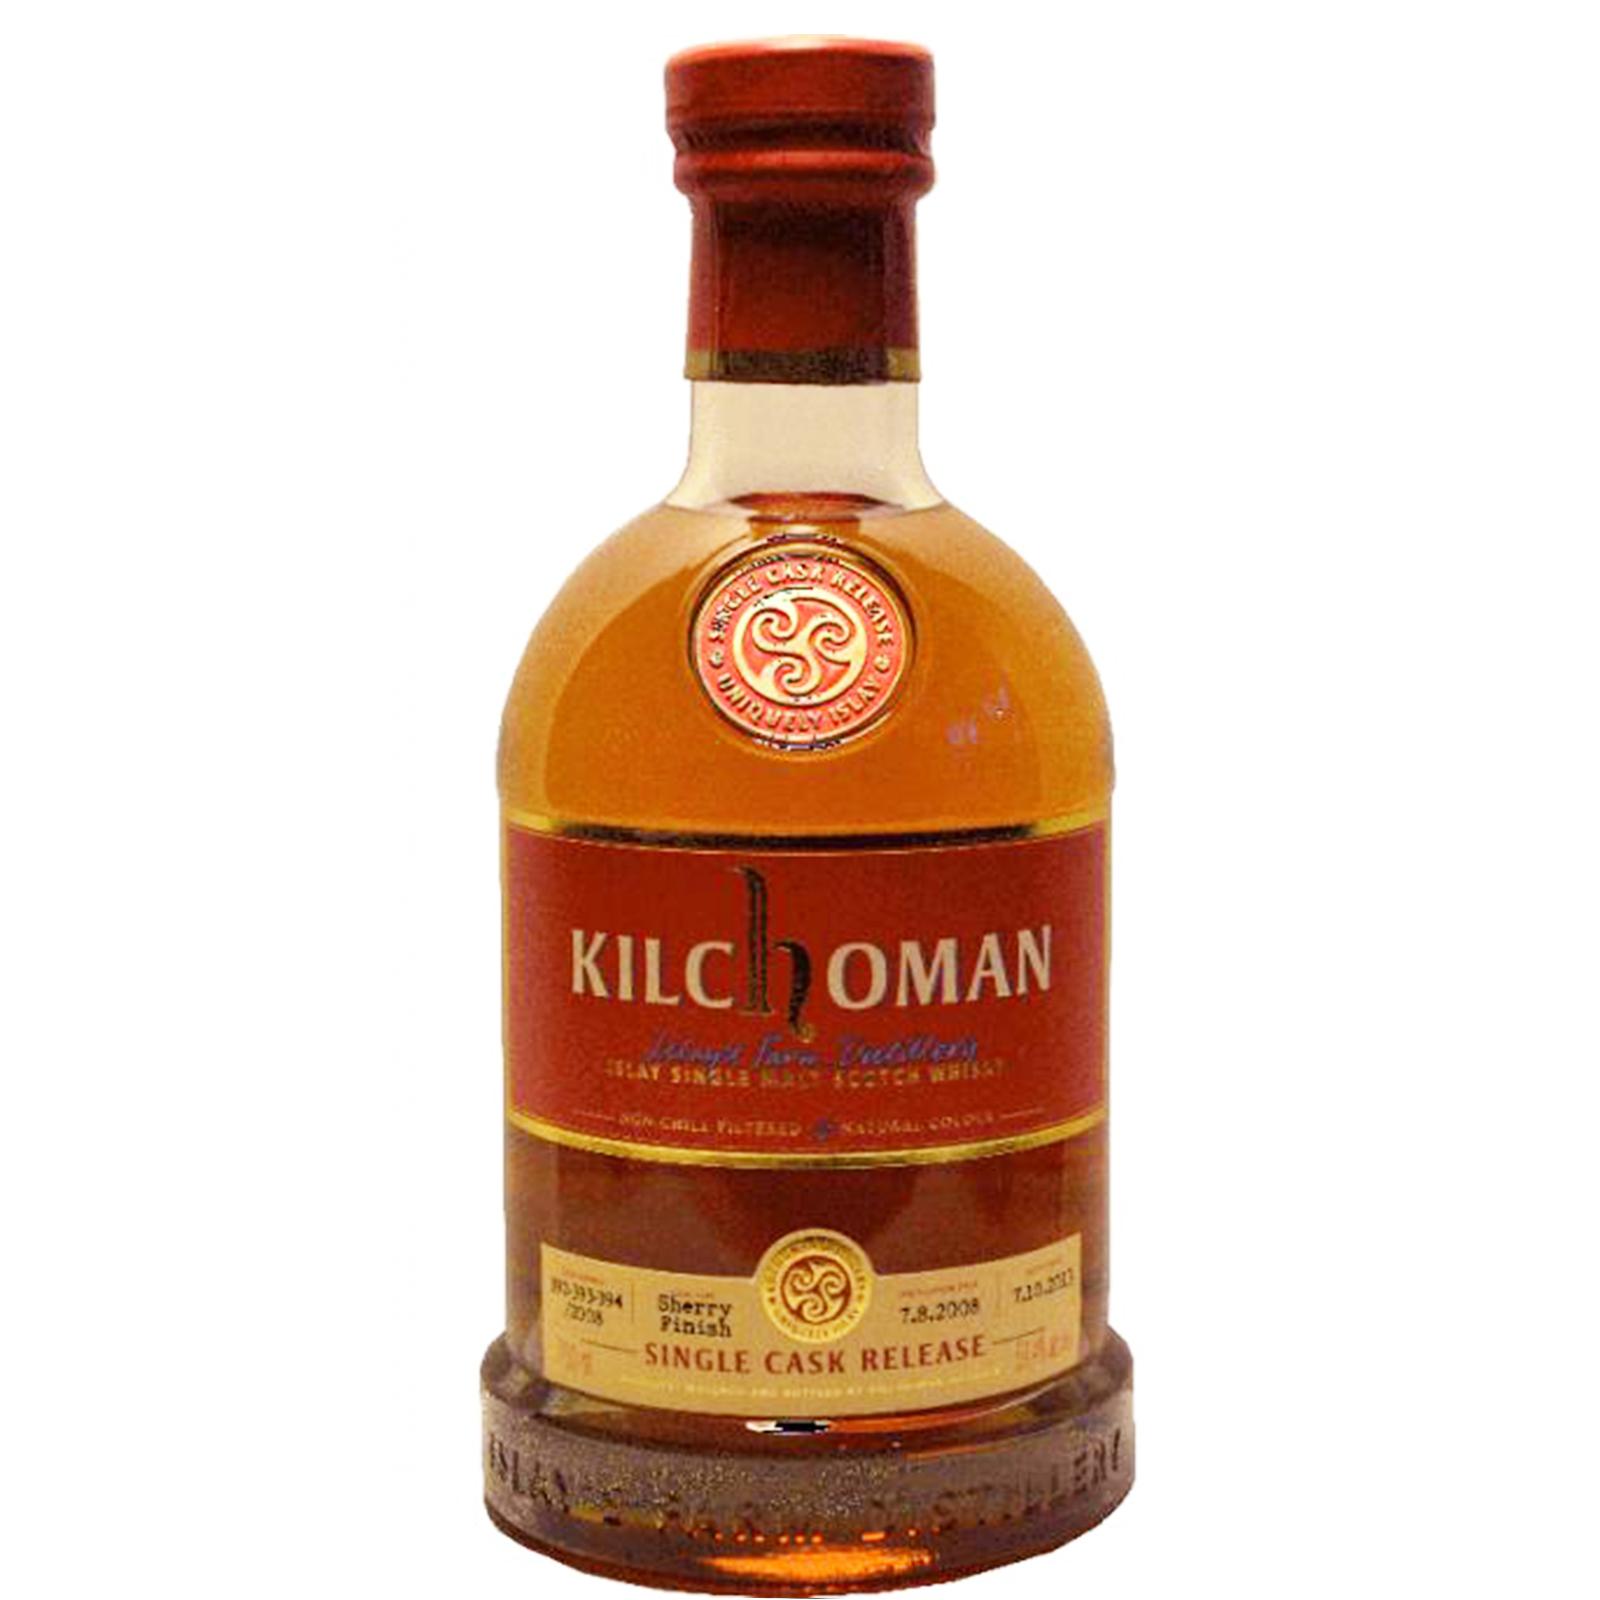 Kilchoman 2008 5 years – cask #392-394/2008